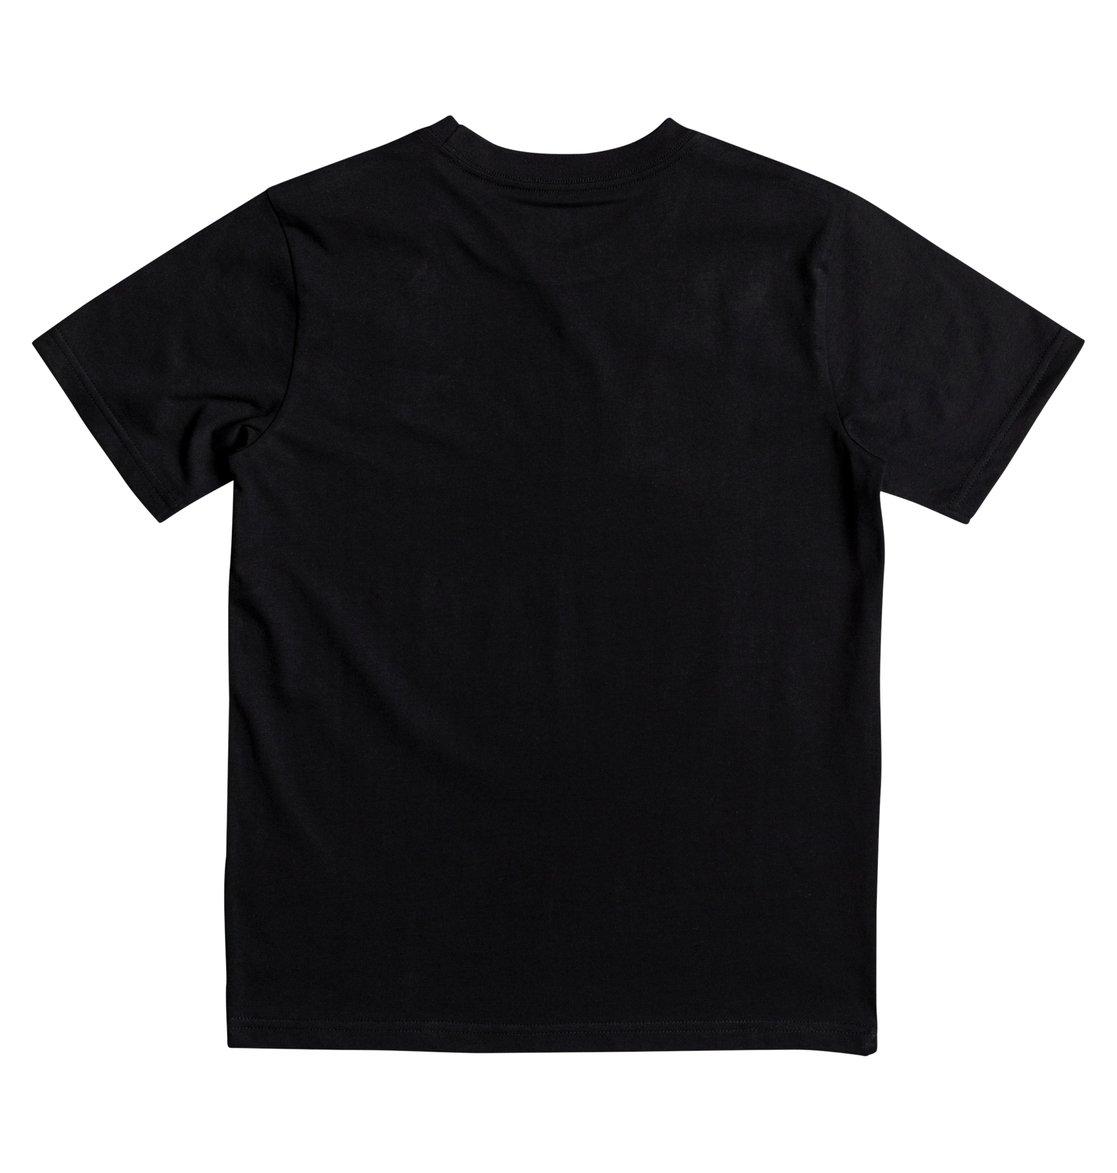 DC-Shoes-City-To-State-Camiseta-Ninos-8-16